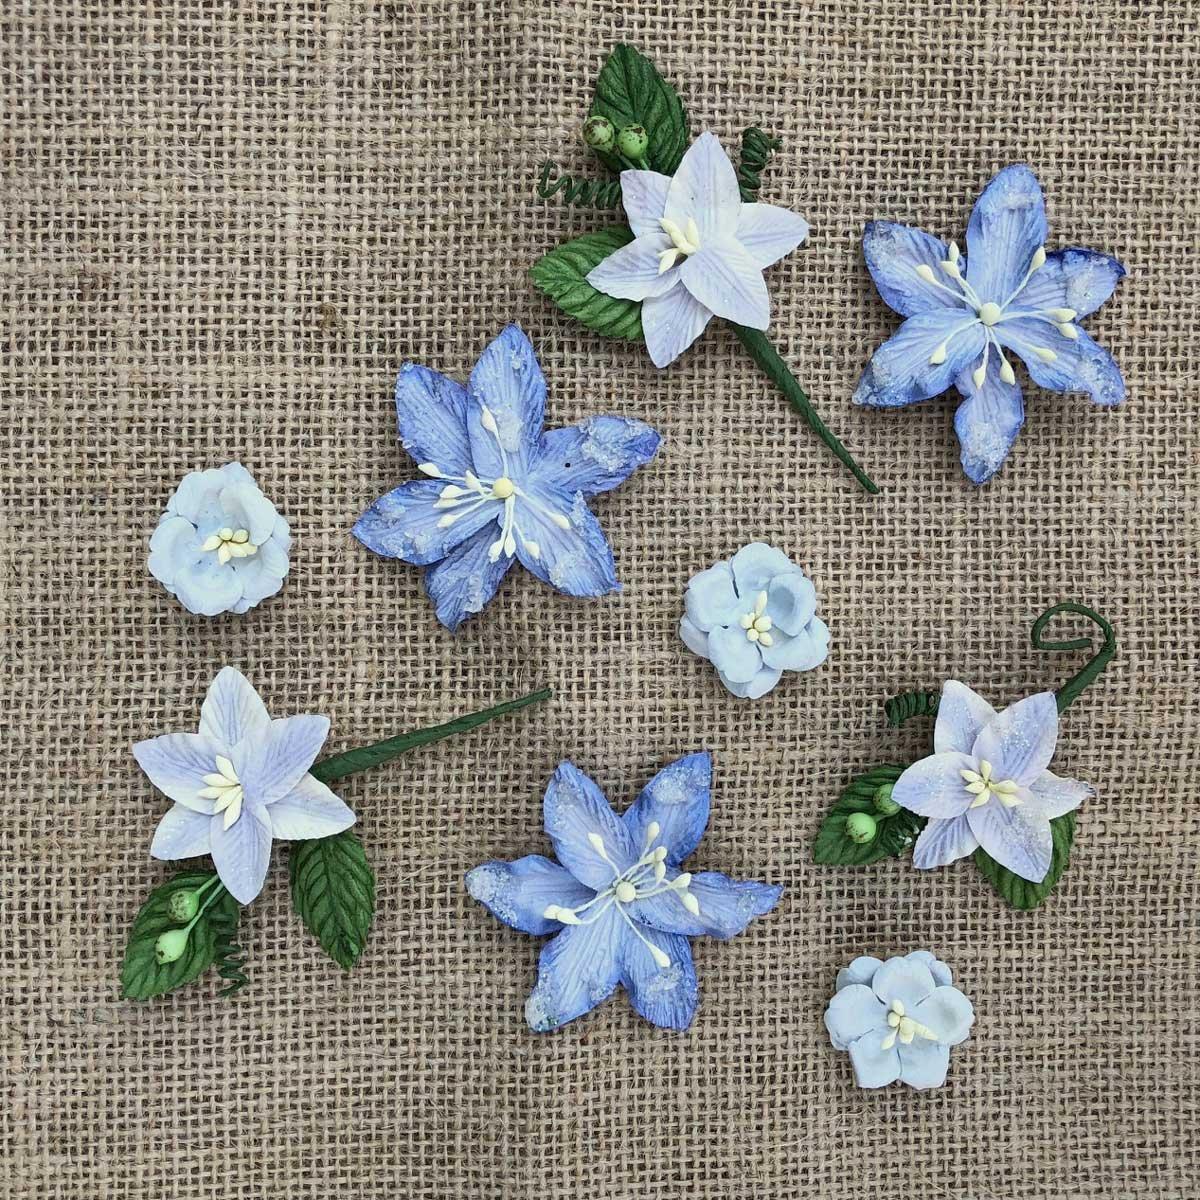 Stargazers Flowers - Periwinkle